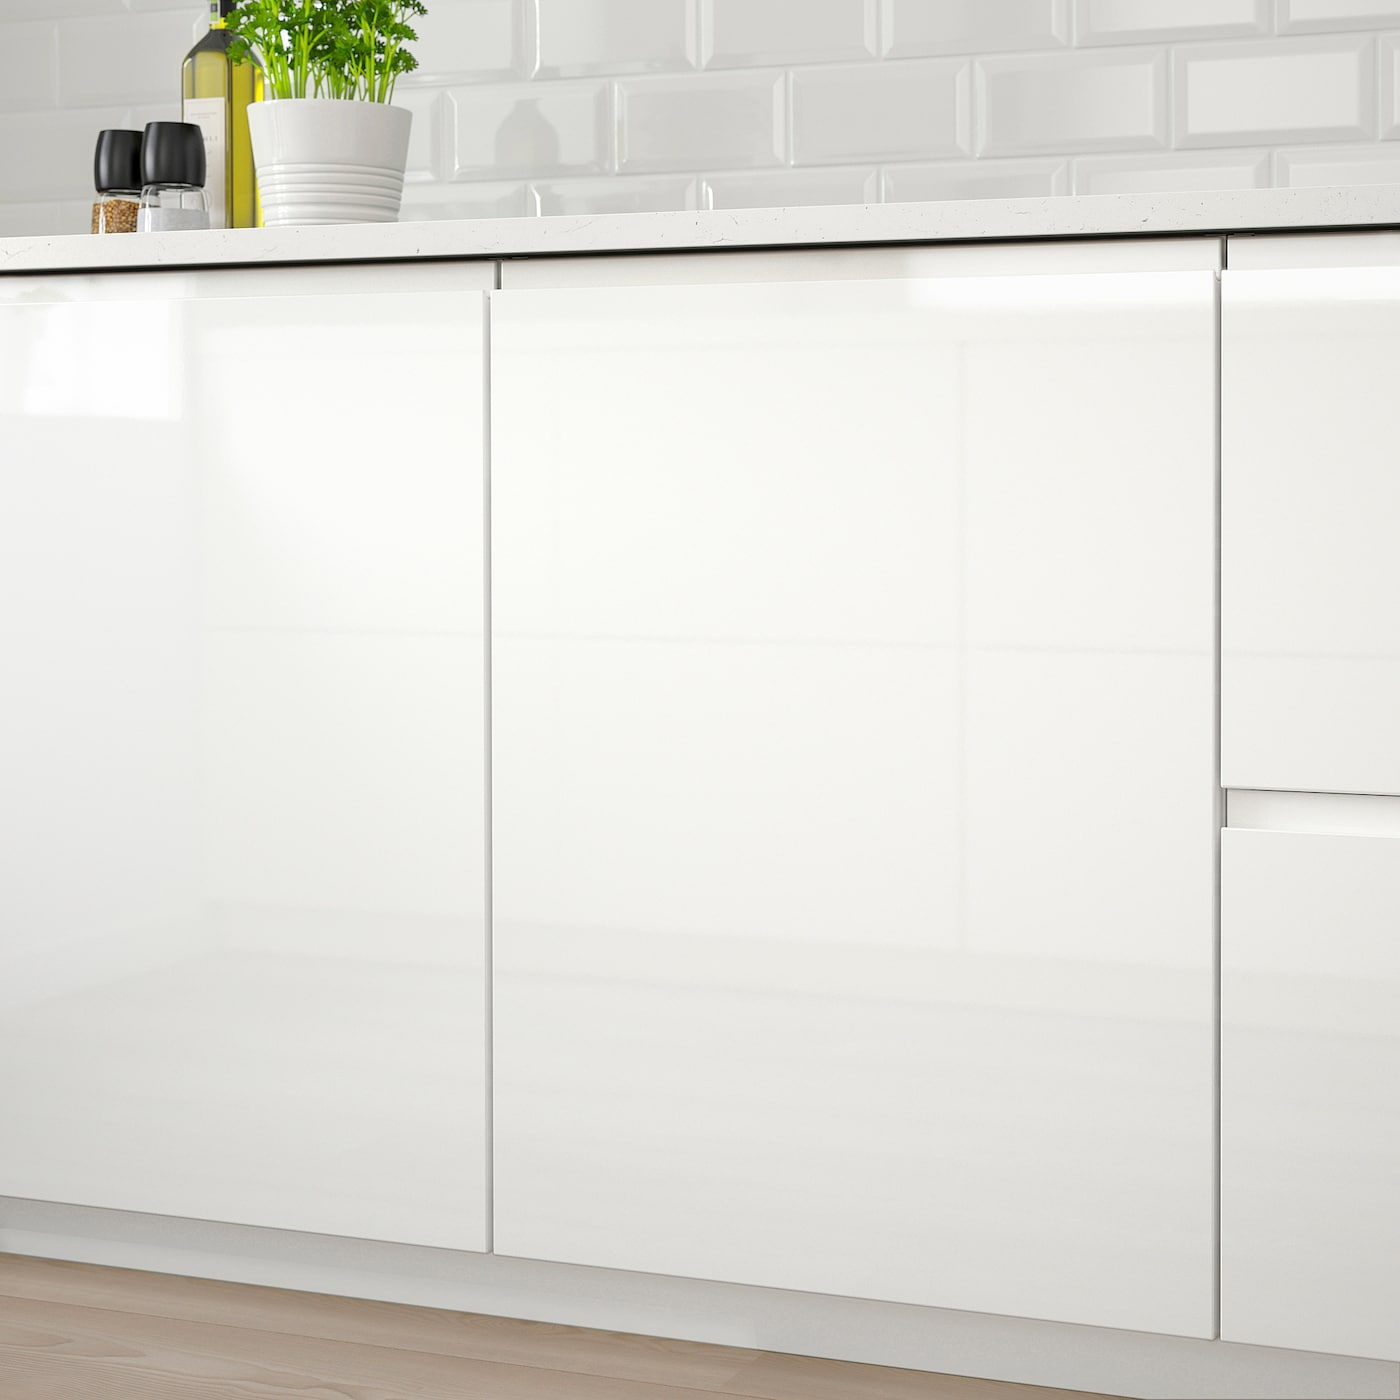 Porte Laque Blanc Ikea voxtorp porte - brillant blanc 60x80 cm